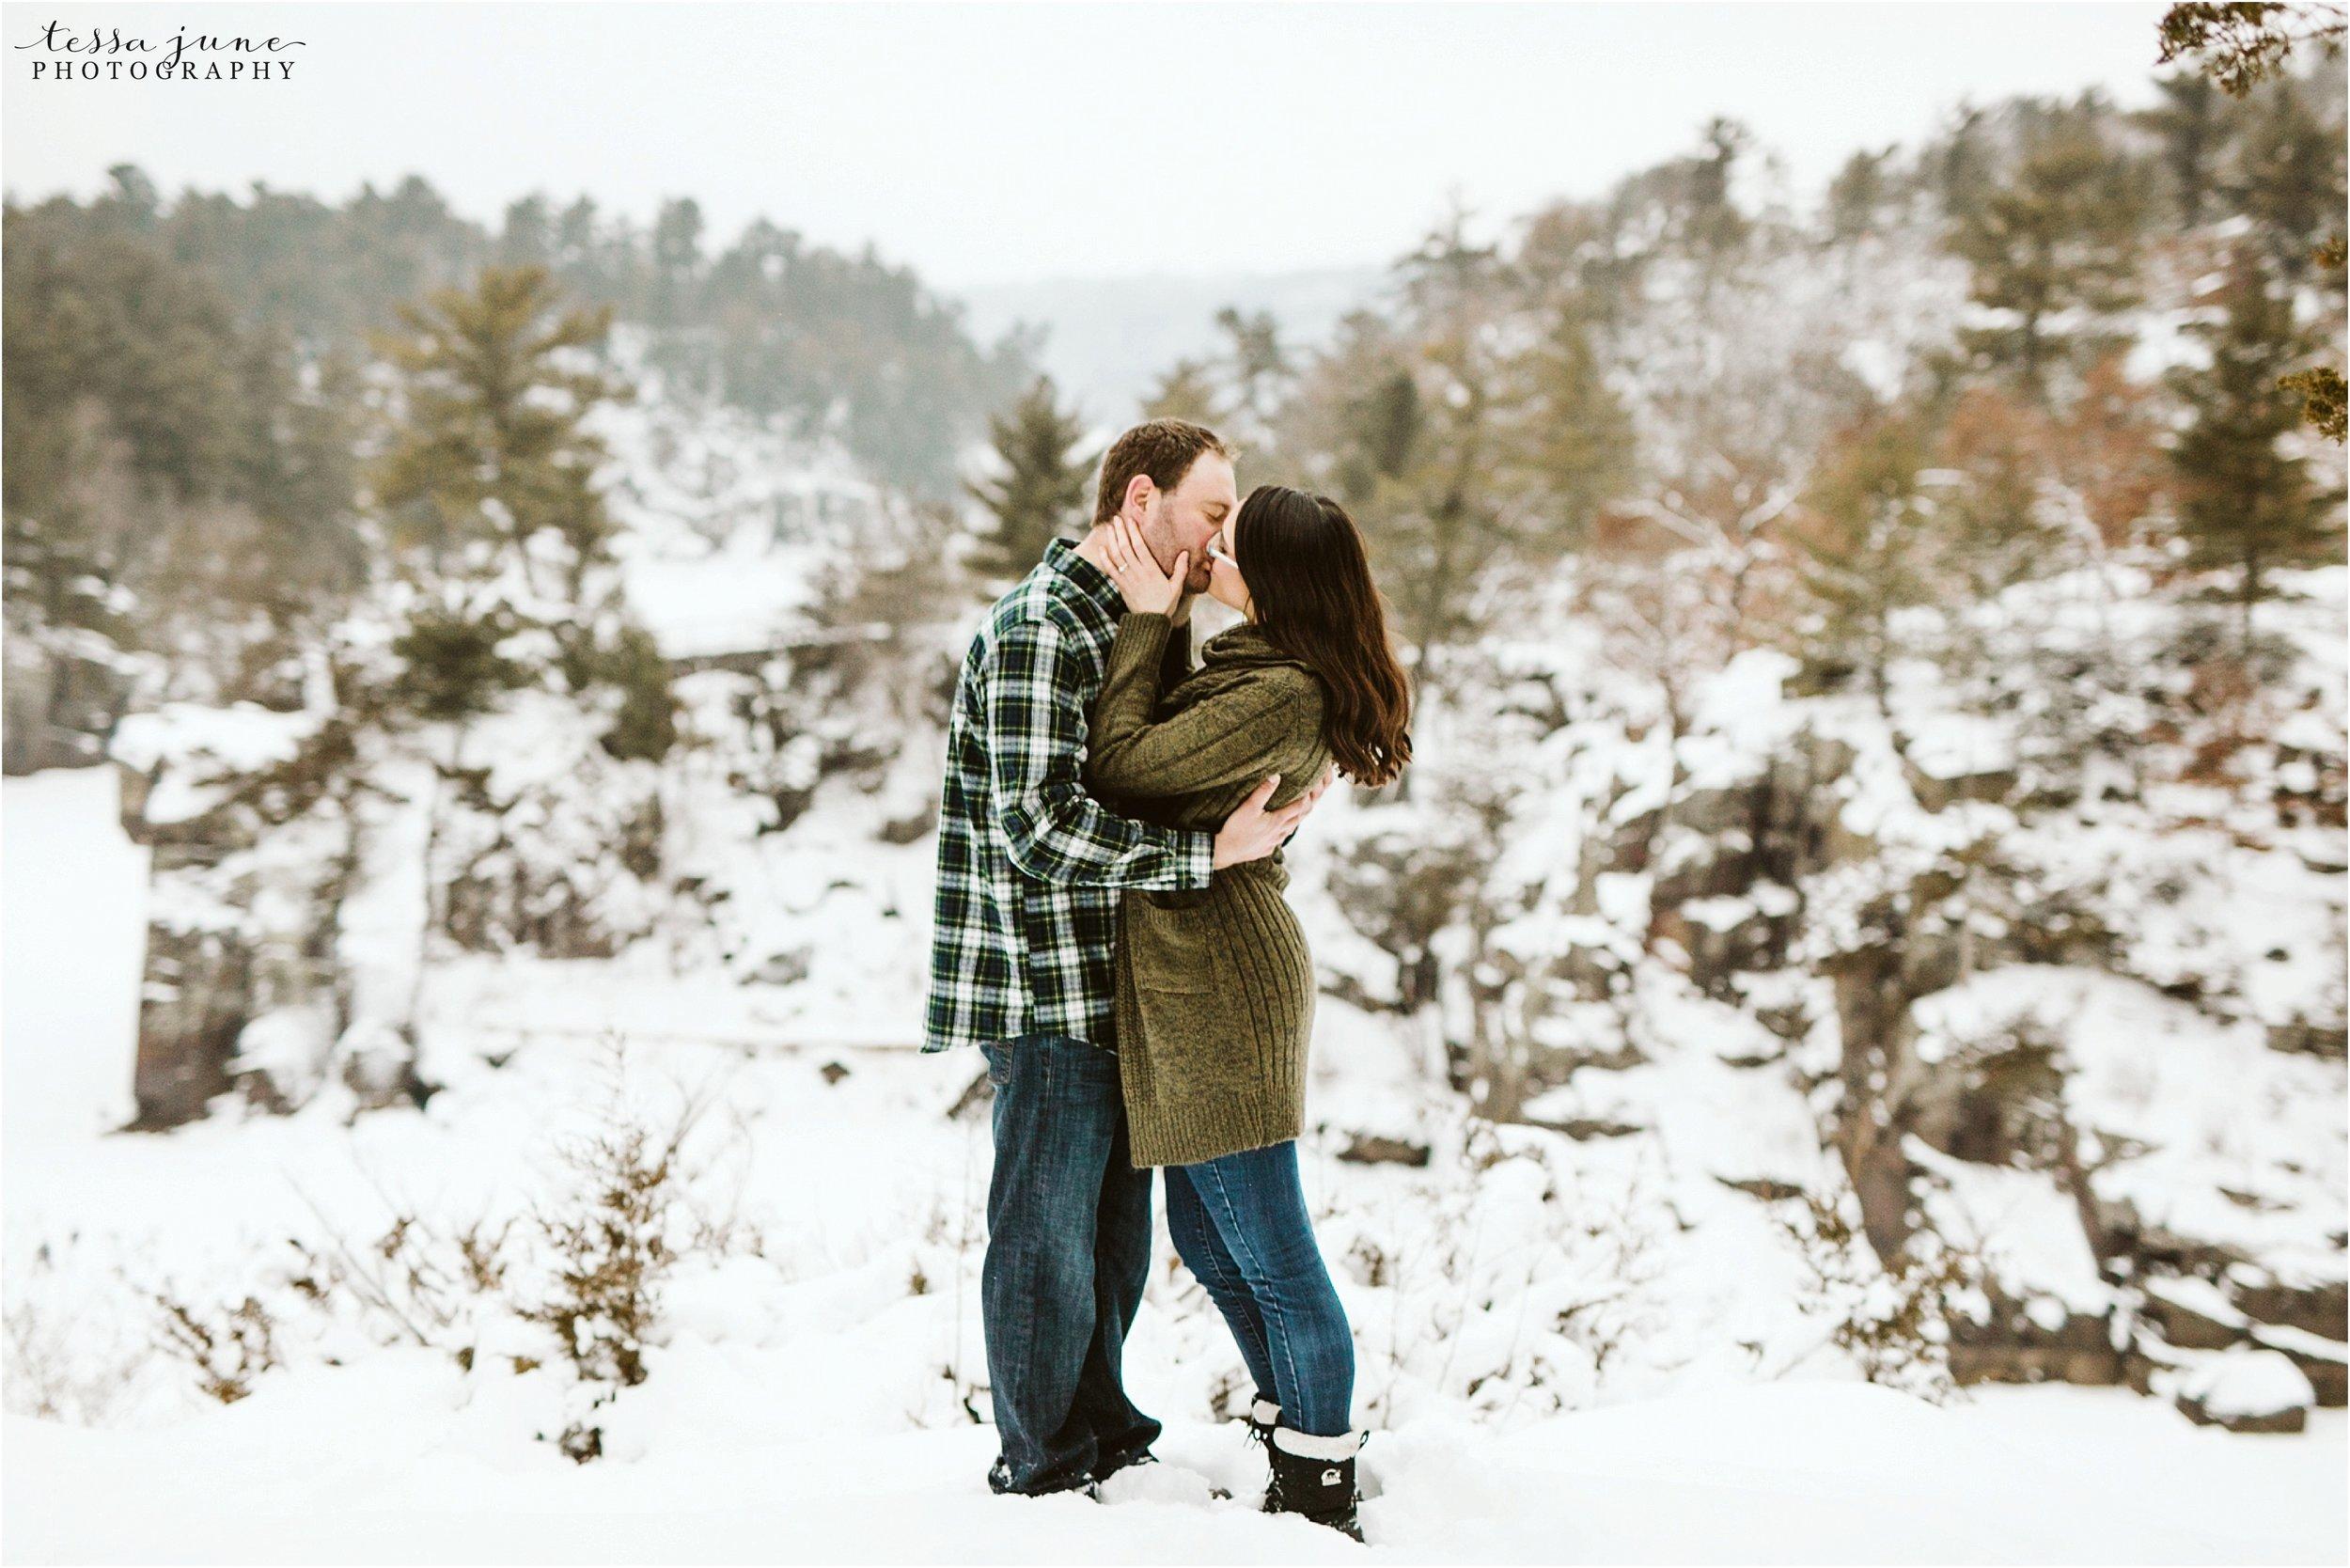 taylors-falls-winter-engagement-session-st-cloud-photographer-32.jpg